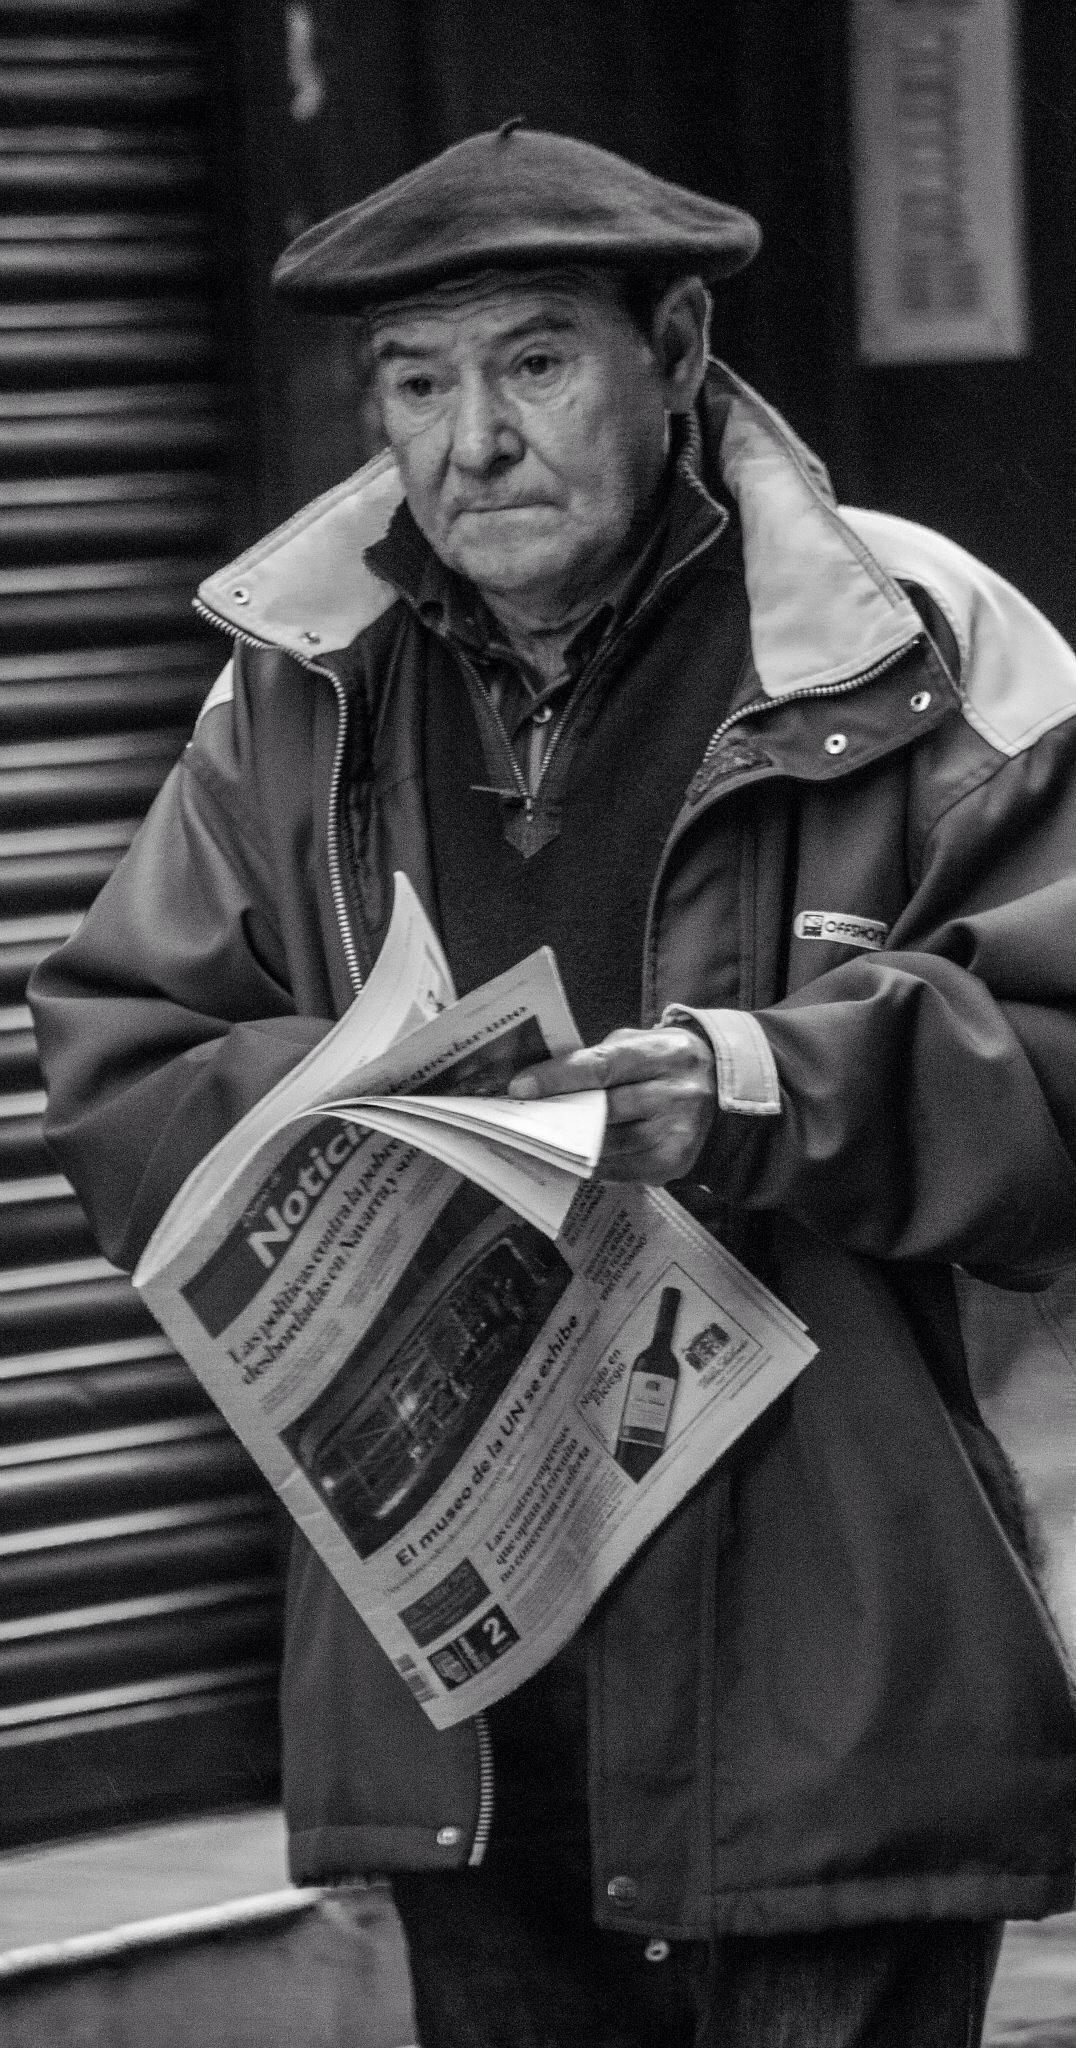 Reader by Lee Russell Wilkes